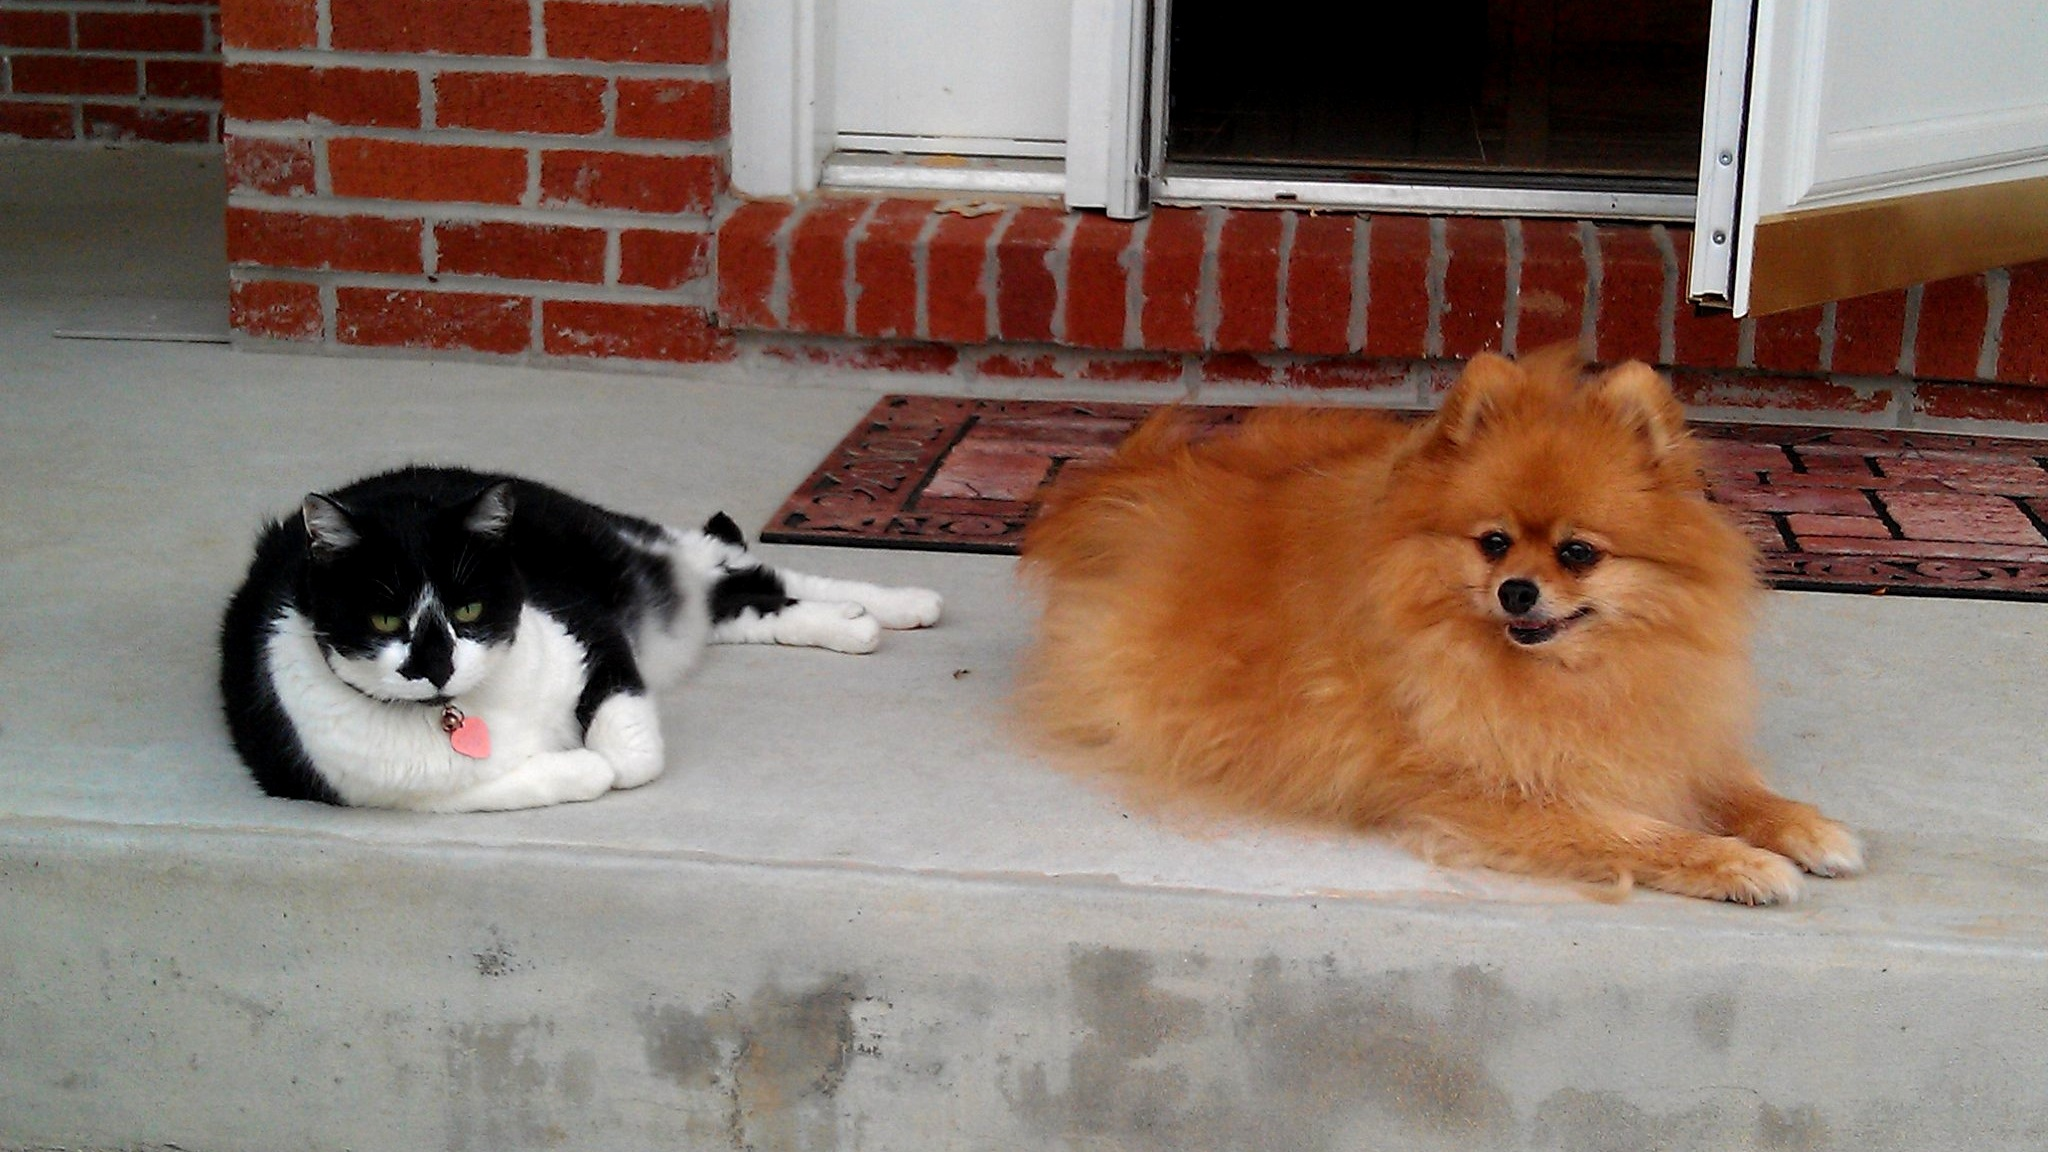 Fluffey-Nicey-Dog-Cat-The-Law-Offices-of-Suraj-A-Vyas-SAVLawfirm-SAV-Law-Firm-Dog-Bite-Animal-Attack.jpg